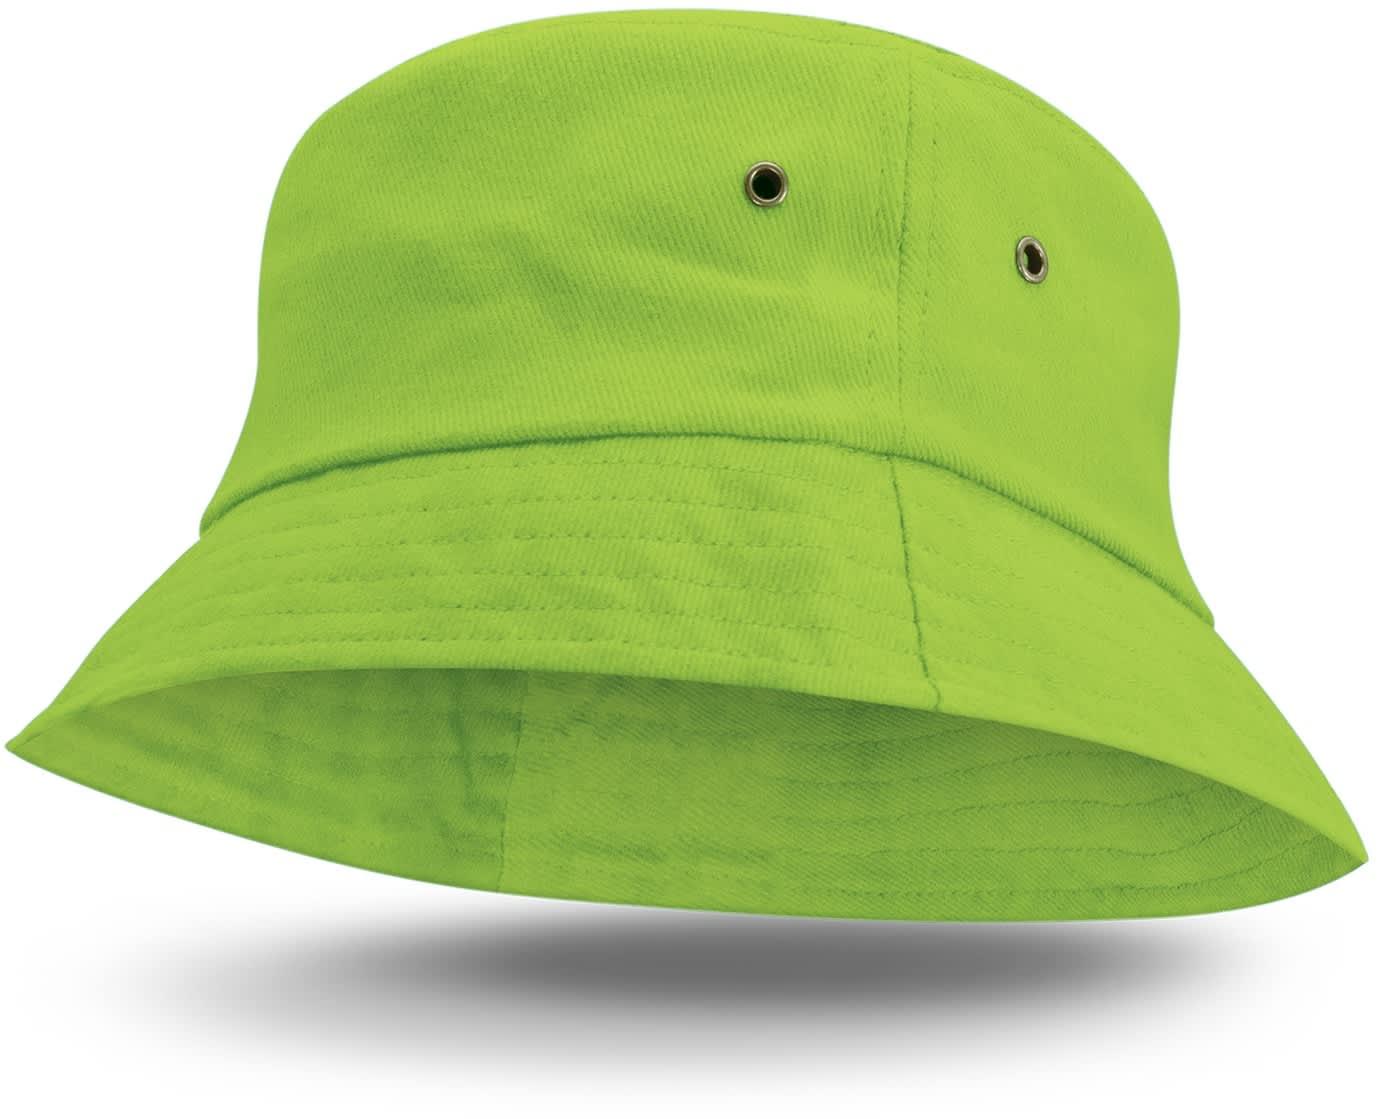 Bright Green Bondi Premium Bucket Hat